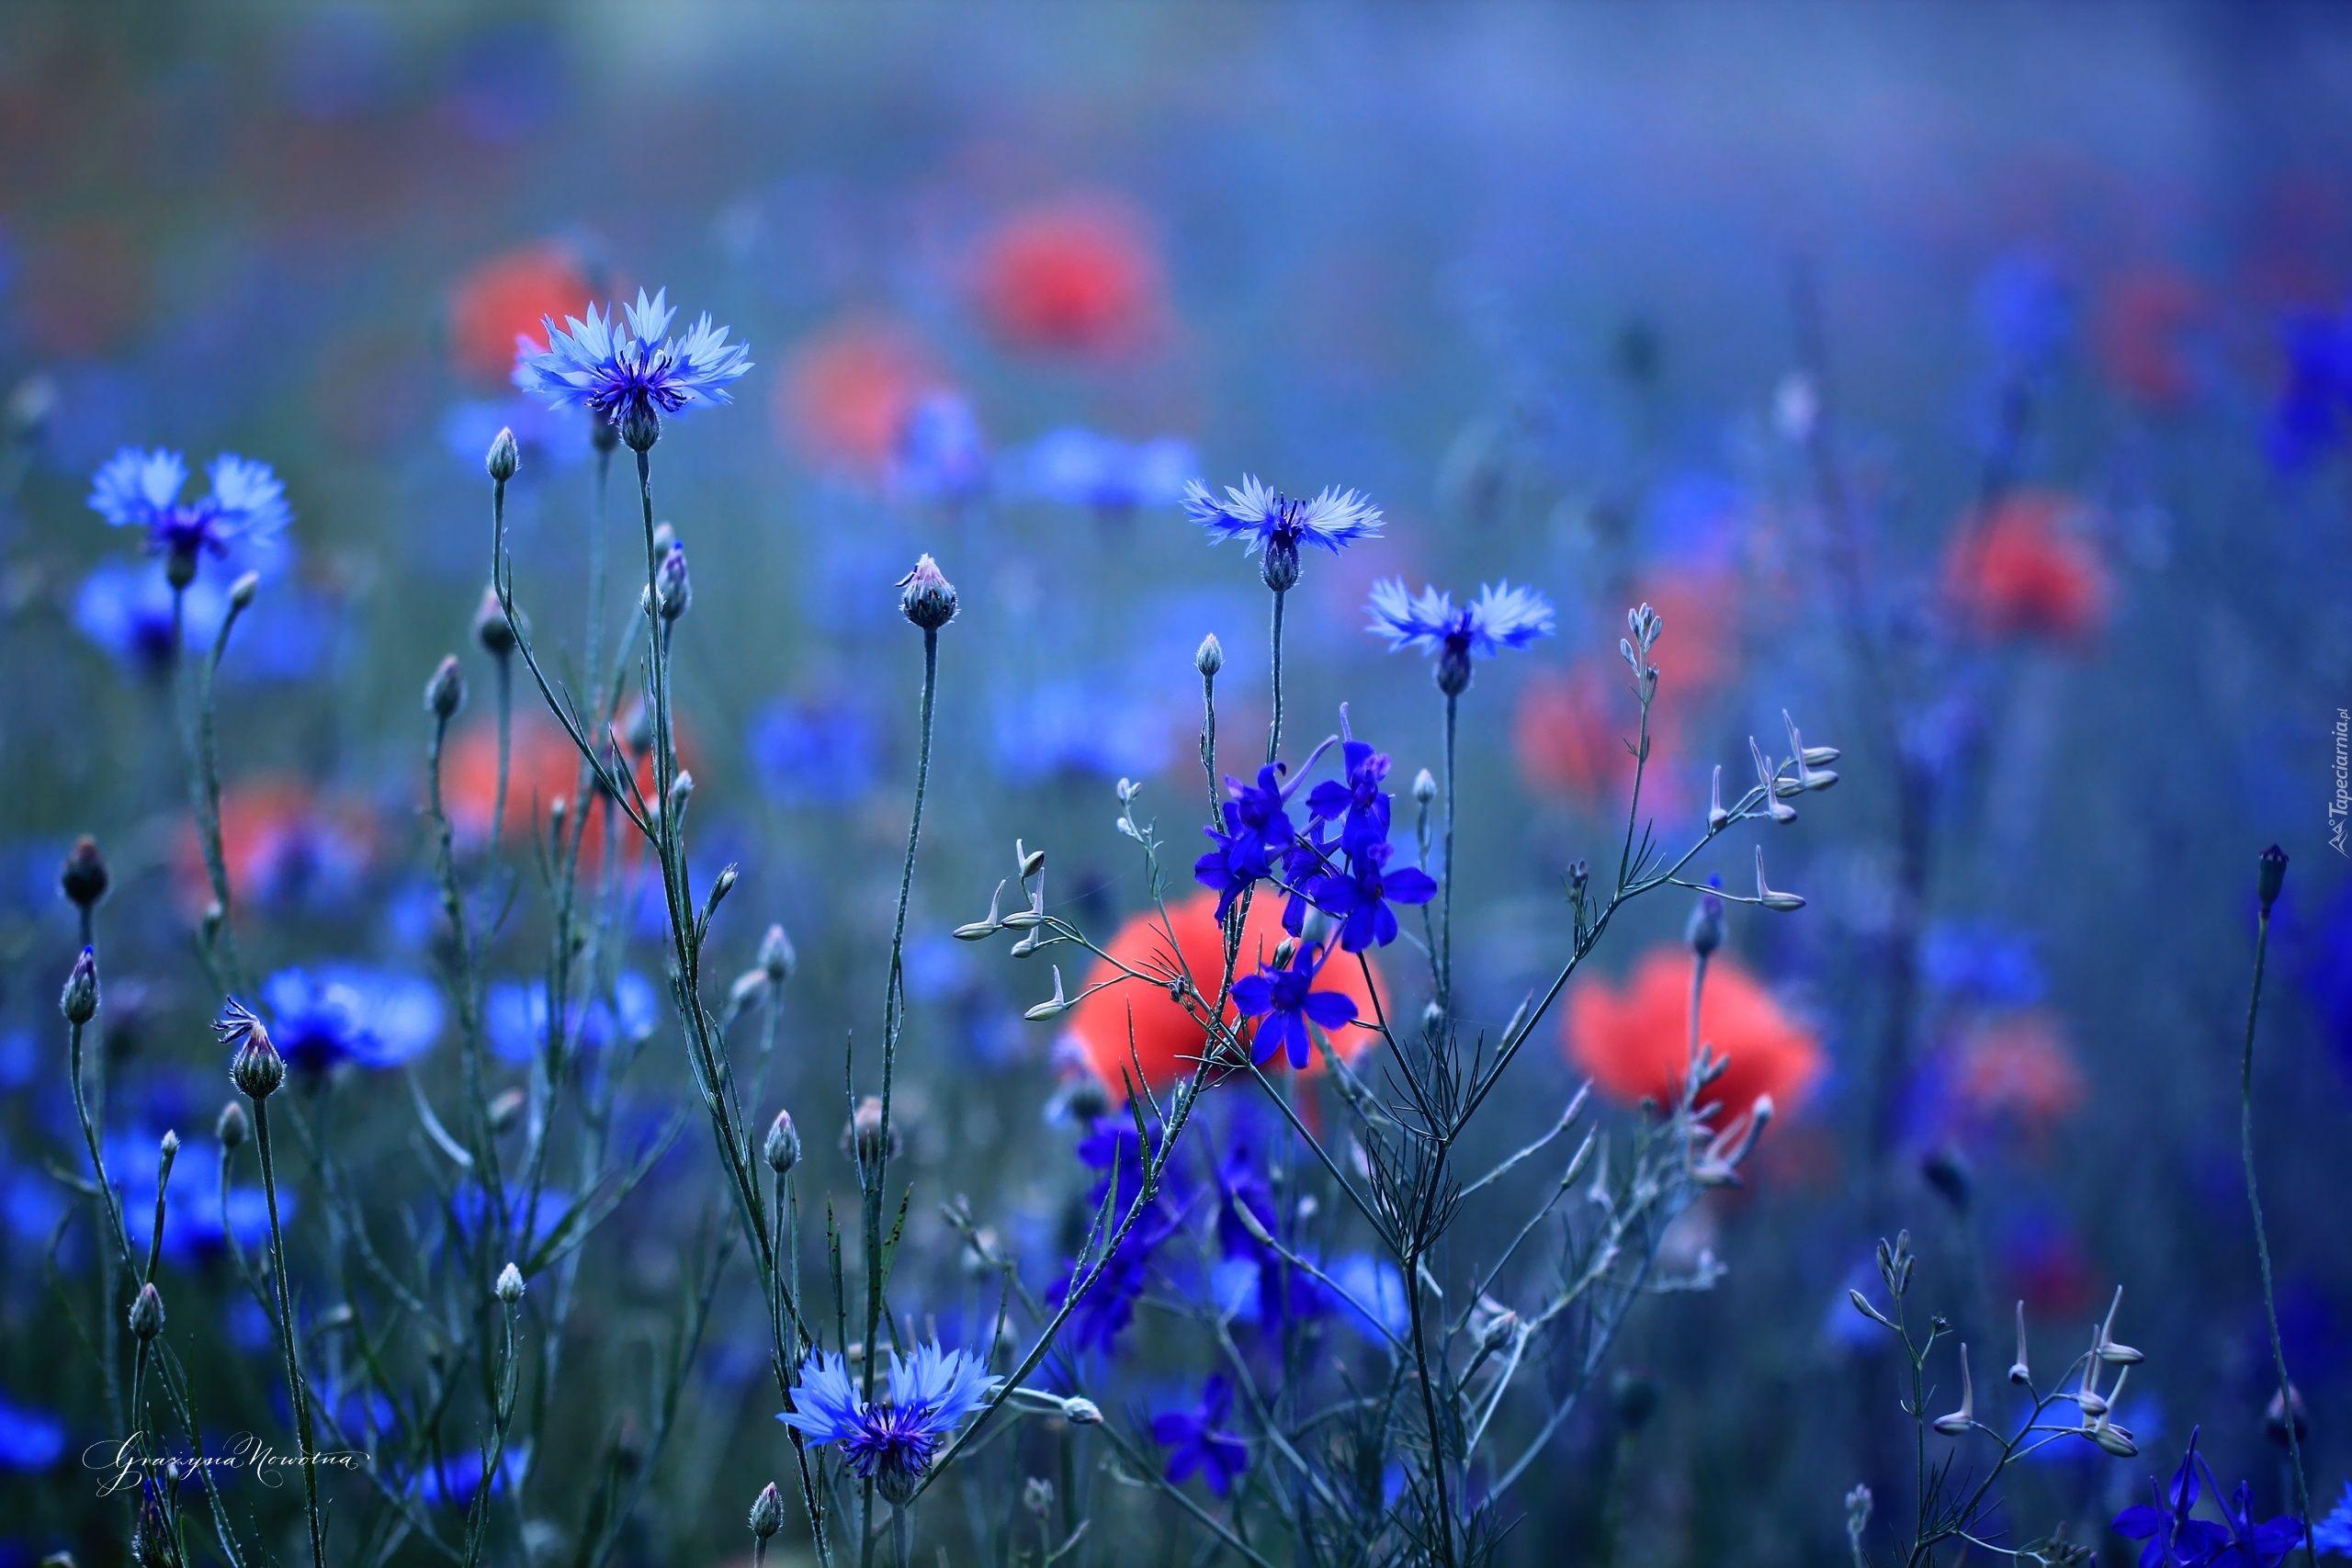 Chabry Niebieskie Kwiaty Chalk Pastel Art Elegant Flowers Beautiful Wallpapers